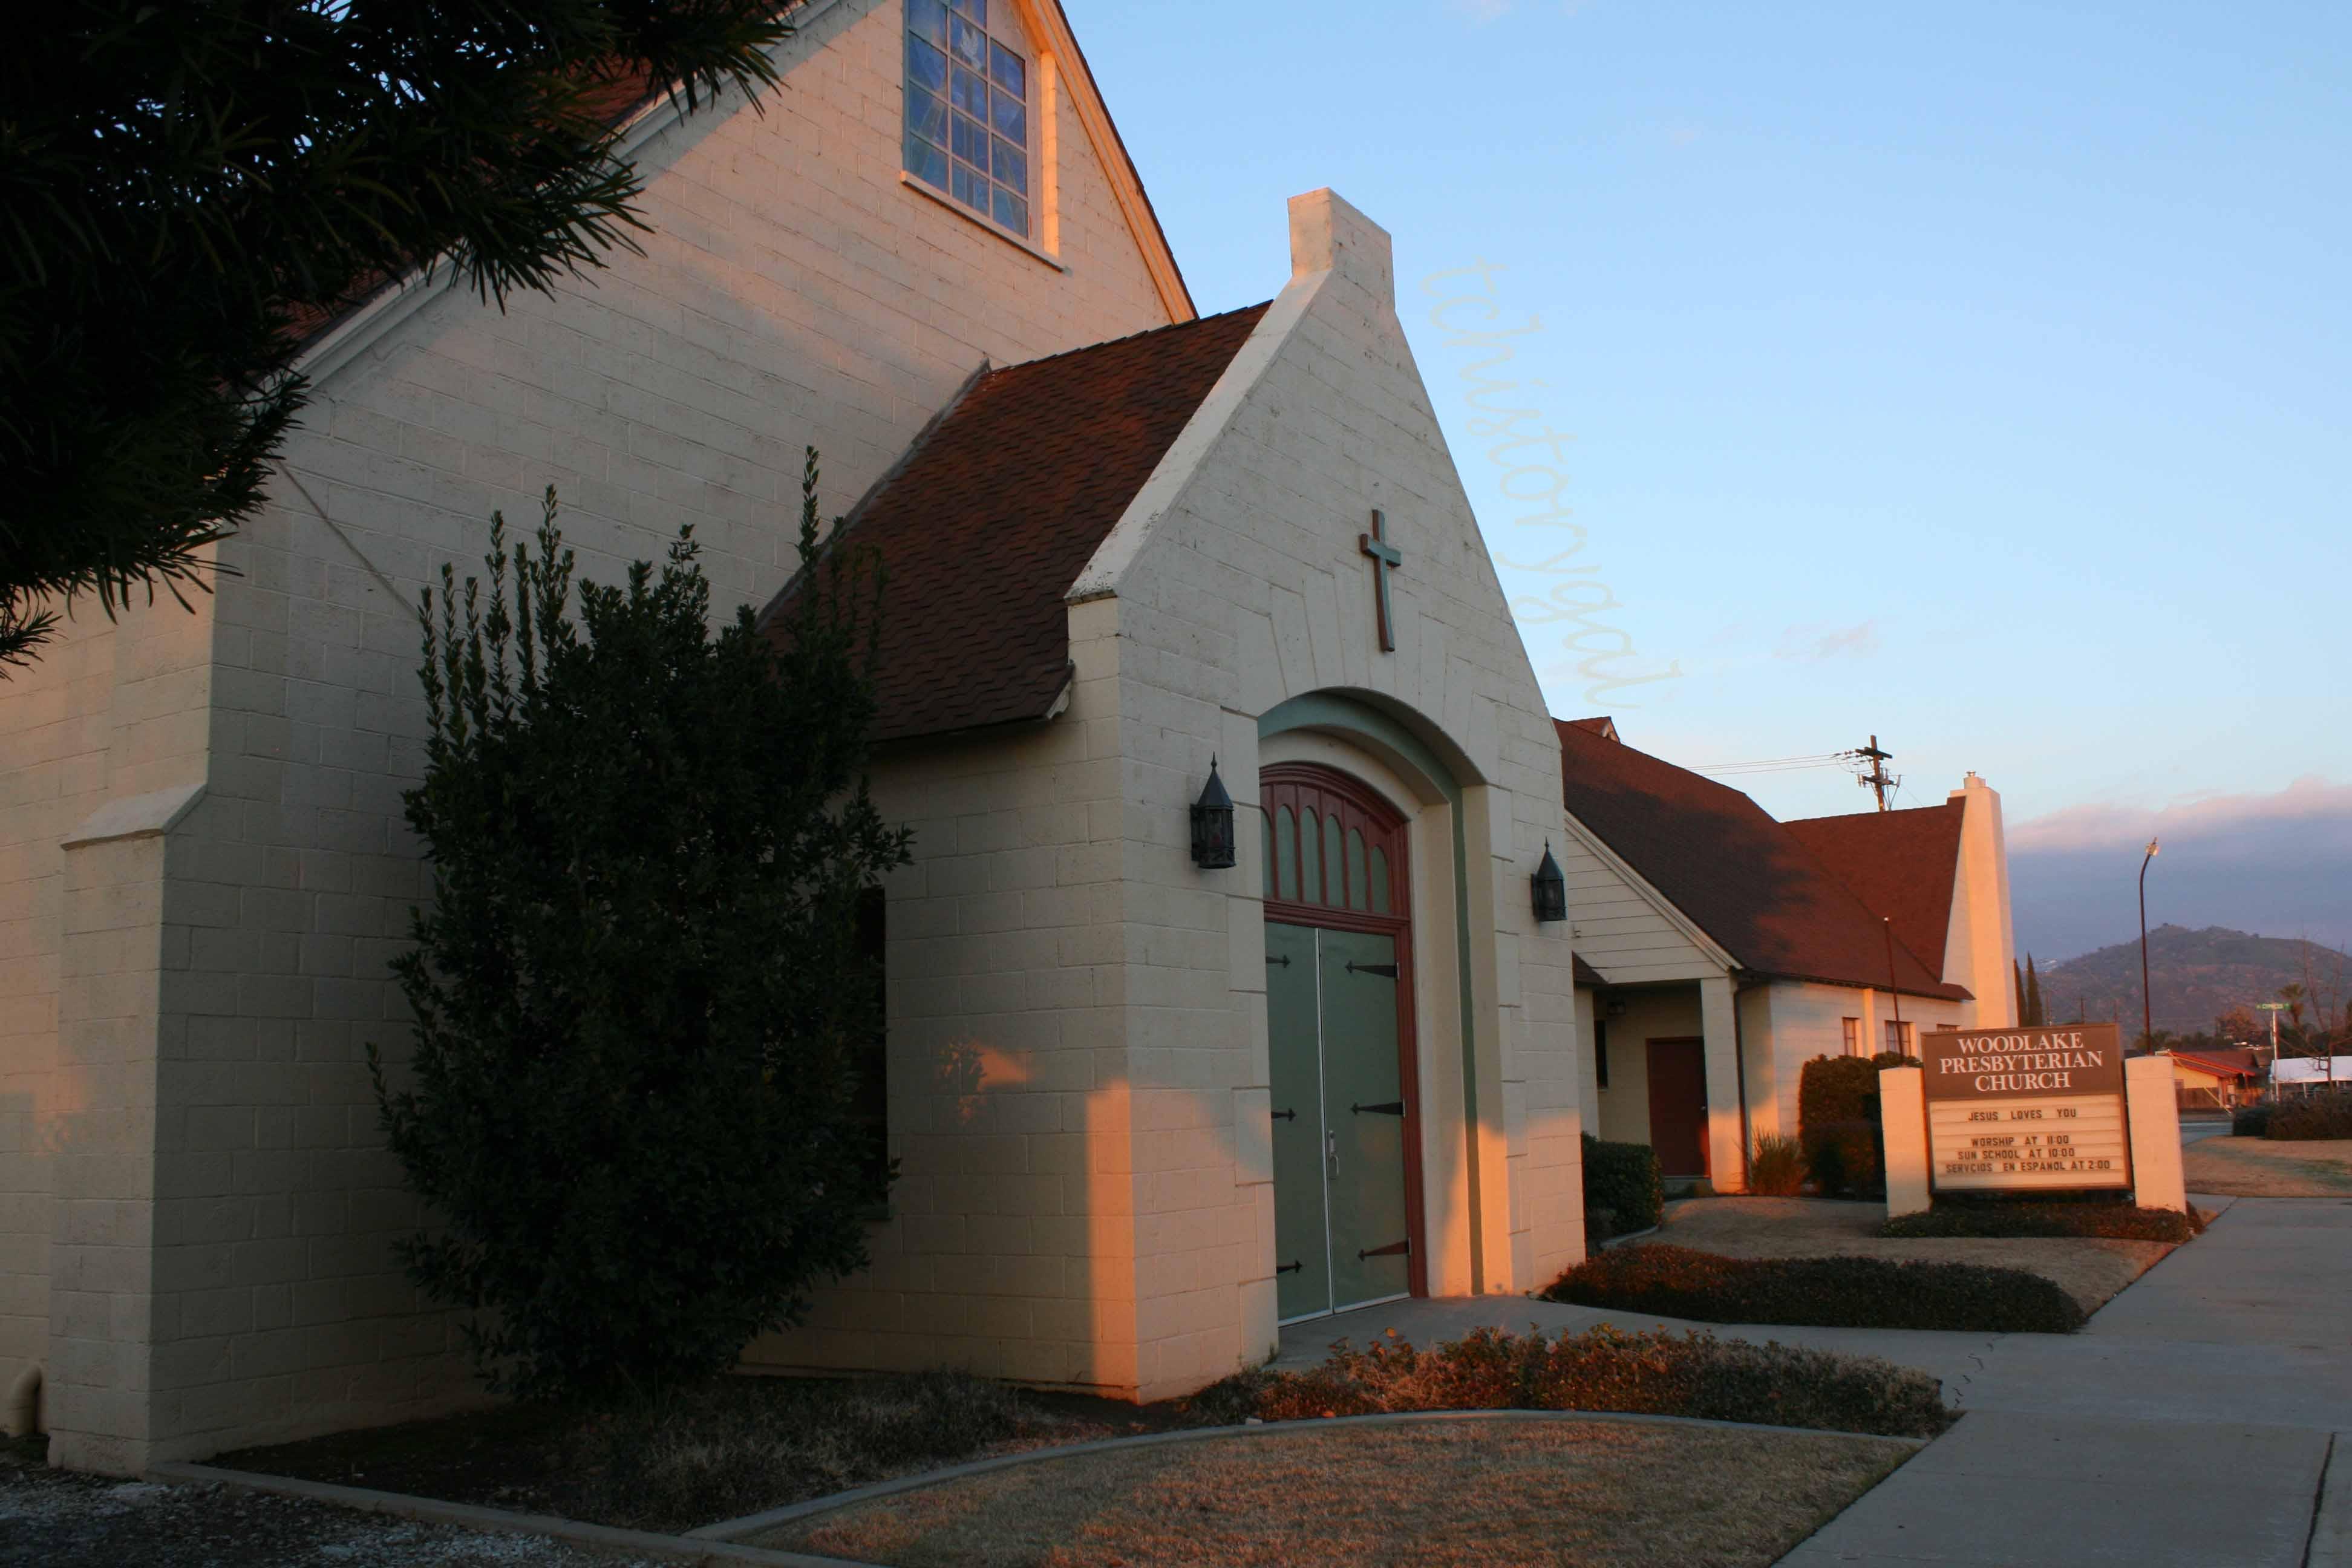 Image result for Woodlake Presbyterian Church, 600 W. Naranjo Blvd., Woodlake